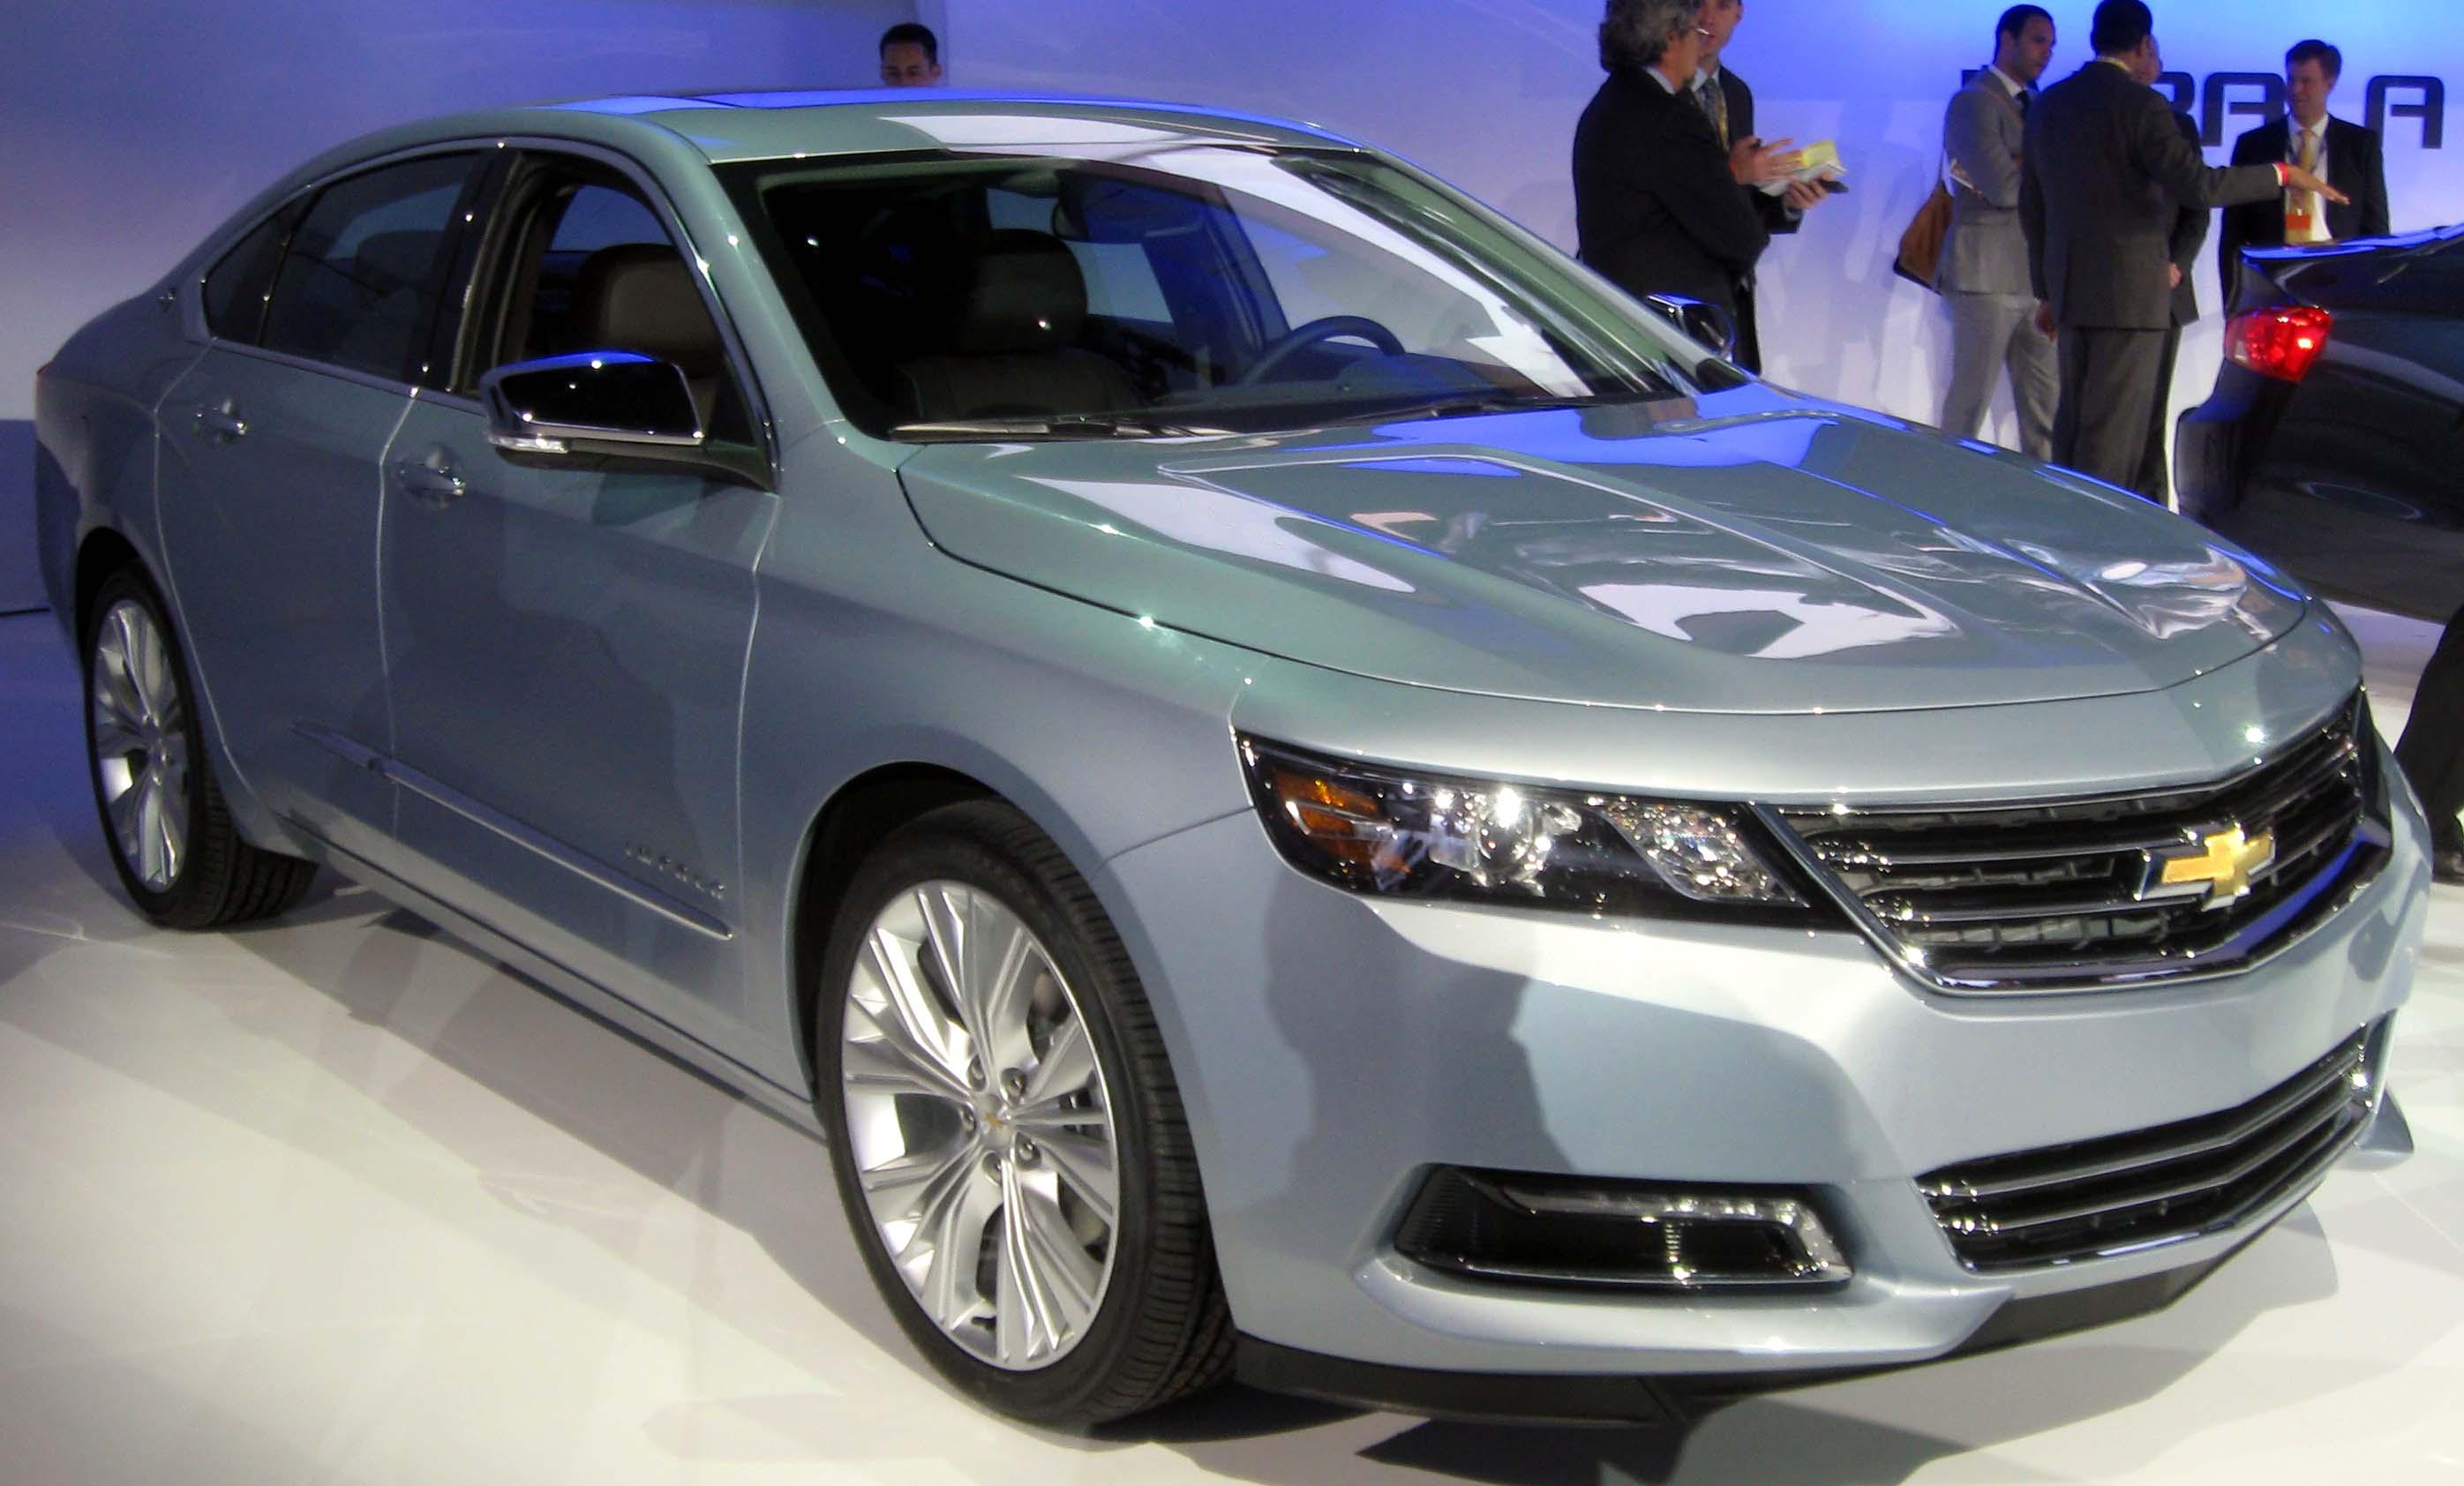 2014 Chevrolet Impala Limited #3 Chevrolet Impala Limited #3